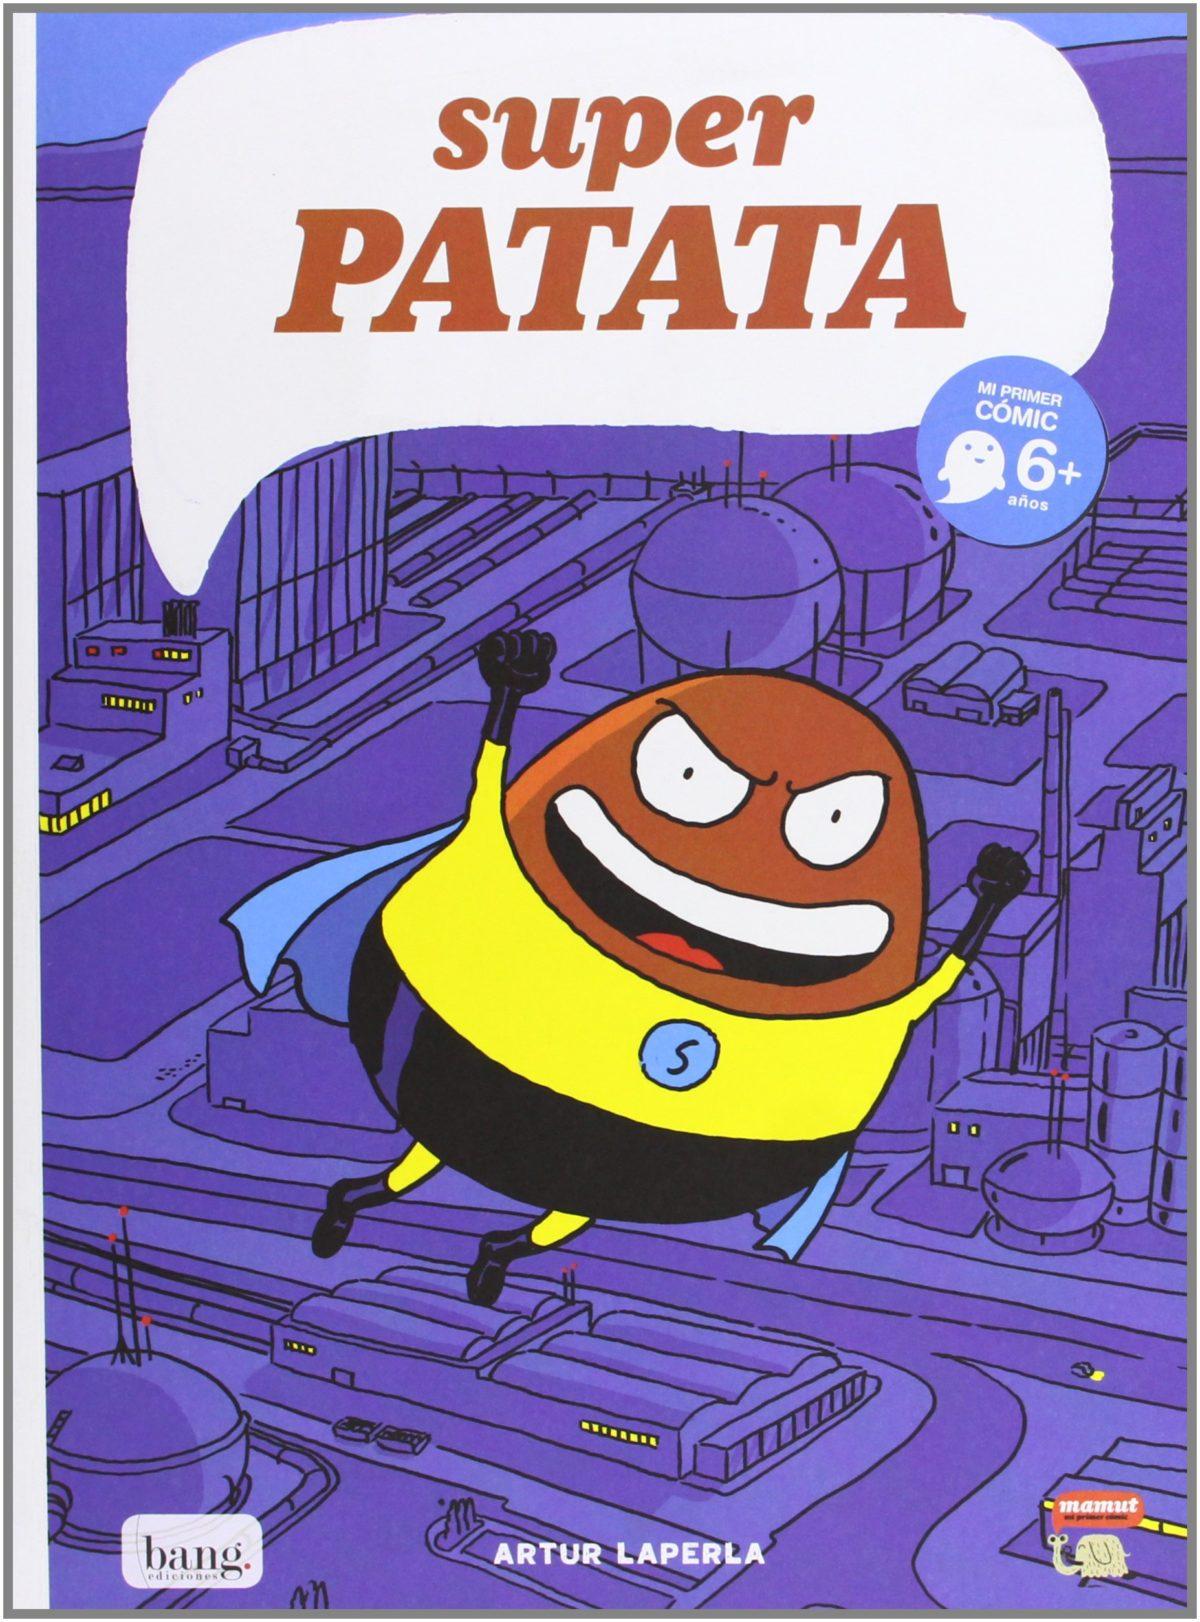 Superpatata: El origen de Superpatata (Mamut 6+) (Español) Tapa blanda